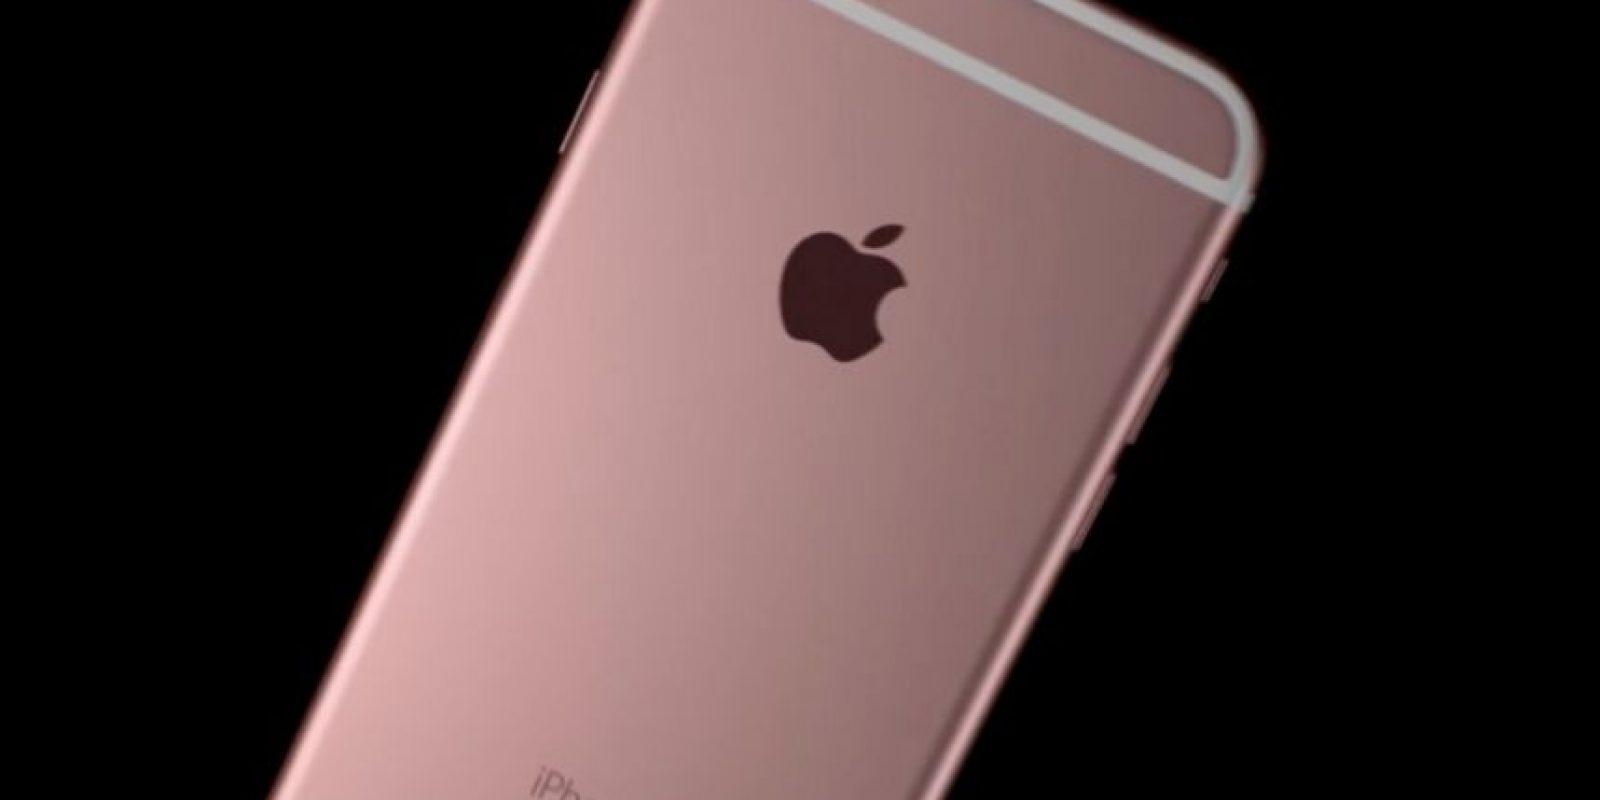 La cámara posterior es de 12 megapíxeles, mientras que la cámara frontal es de 5 megapíxeles. Foto:Apple